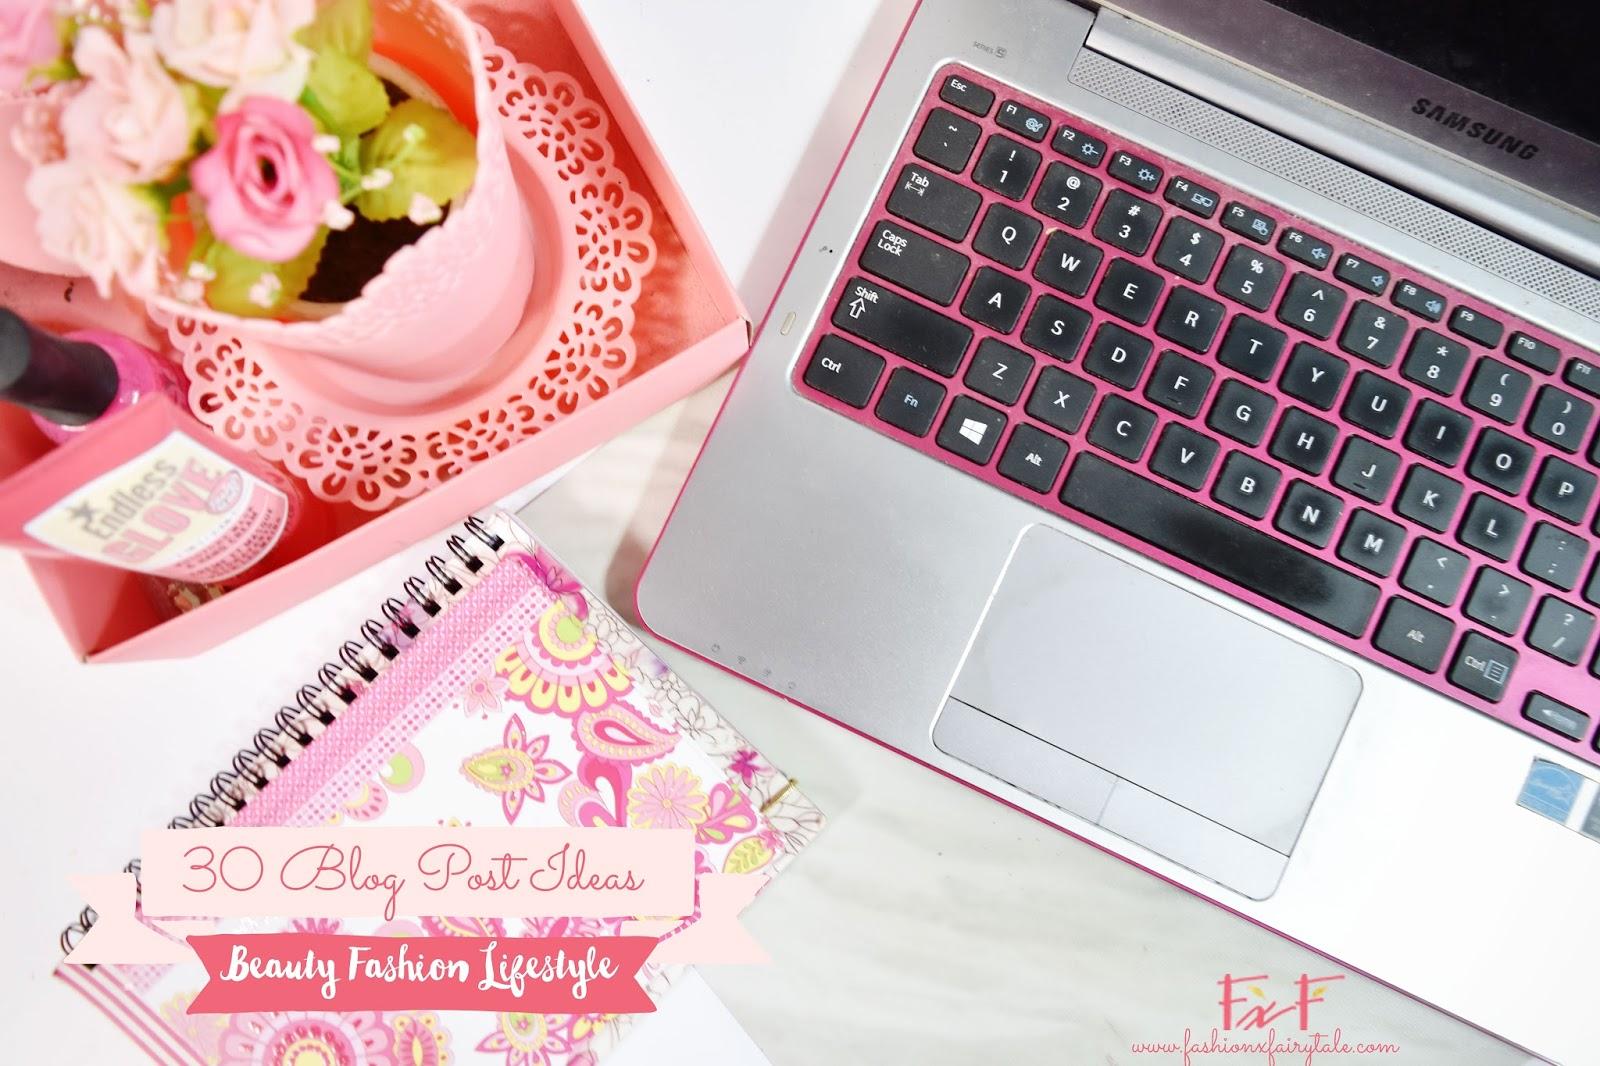 30 Beauty Fashion & Lifestyle Blog Post Ideas - Fashion ...